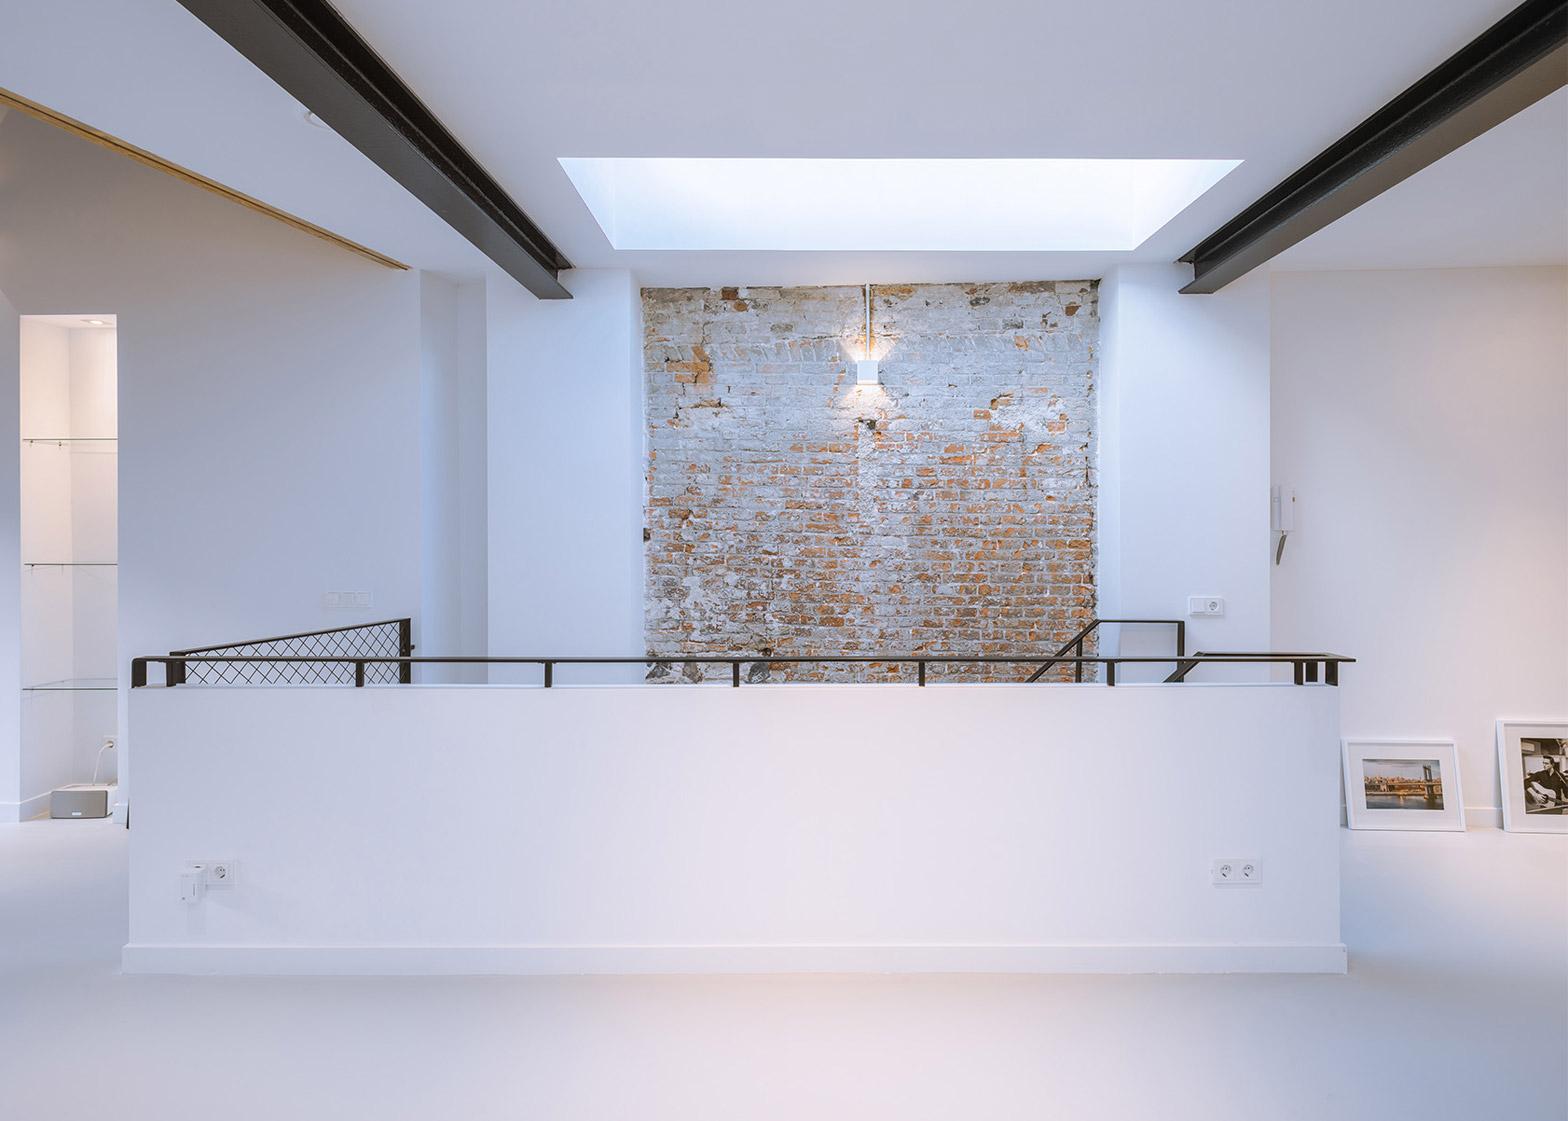 architecture_loft_design_studia_interiors_osnovadesign_osnova_poltava_04